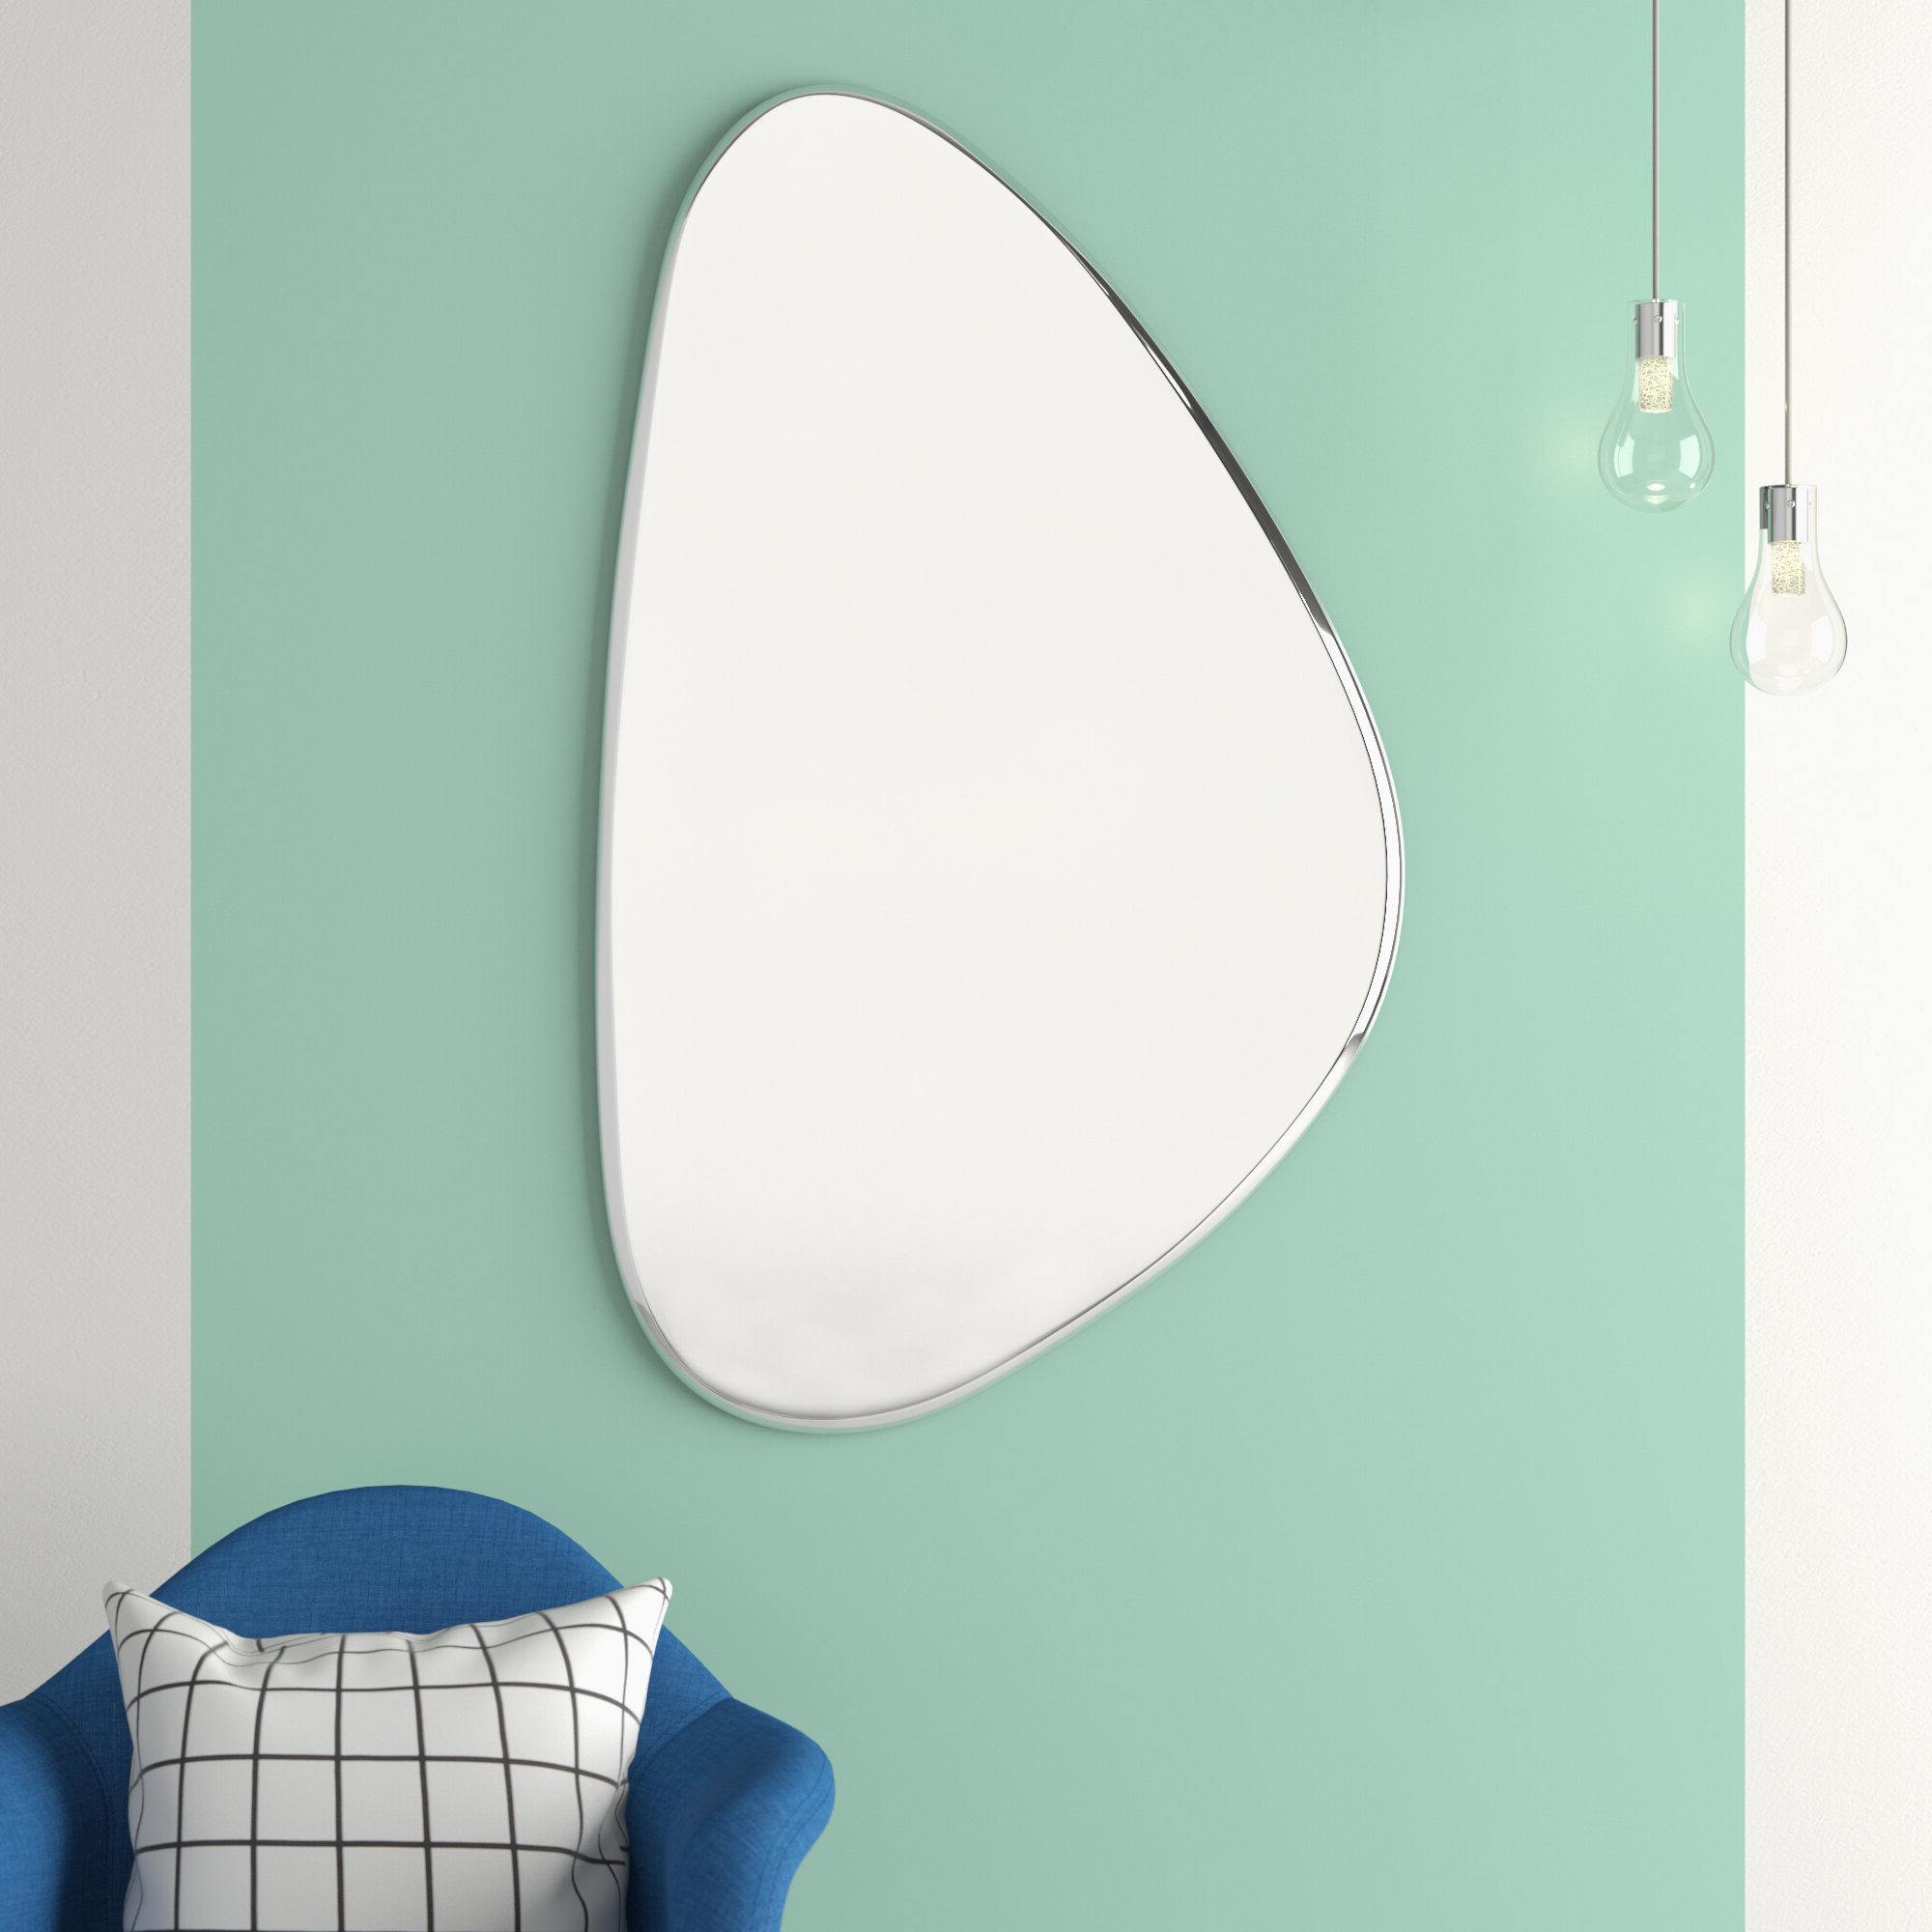 Clintonville Frameless Wall Mirror With Regard To Most Current Frameless Wall Mirrors (View 6 of 20)